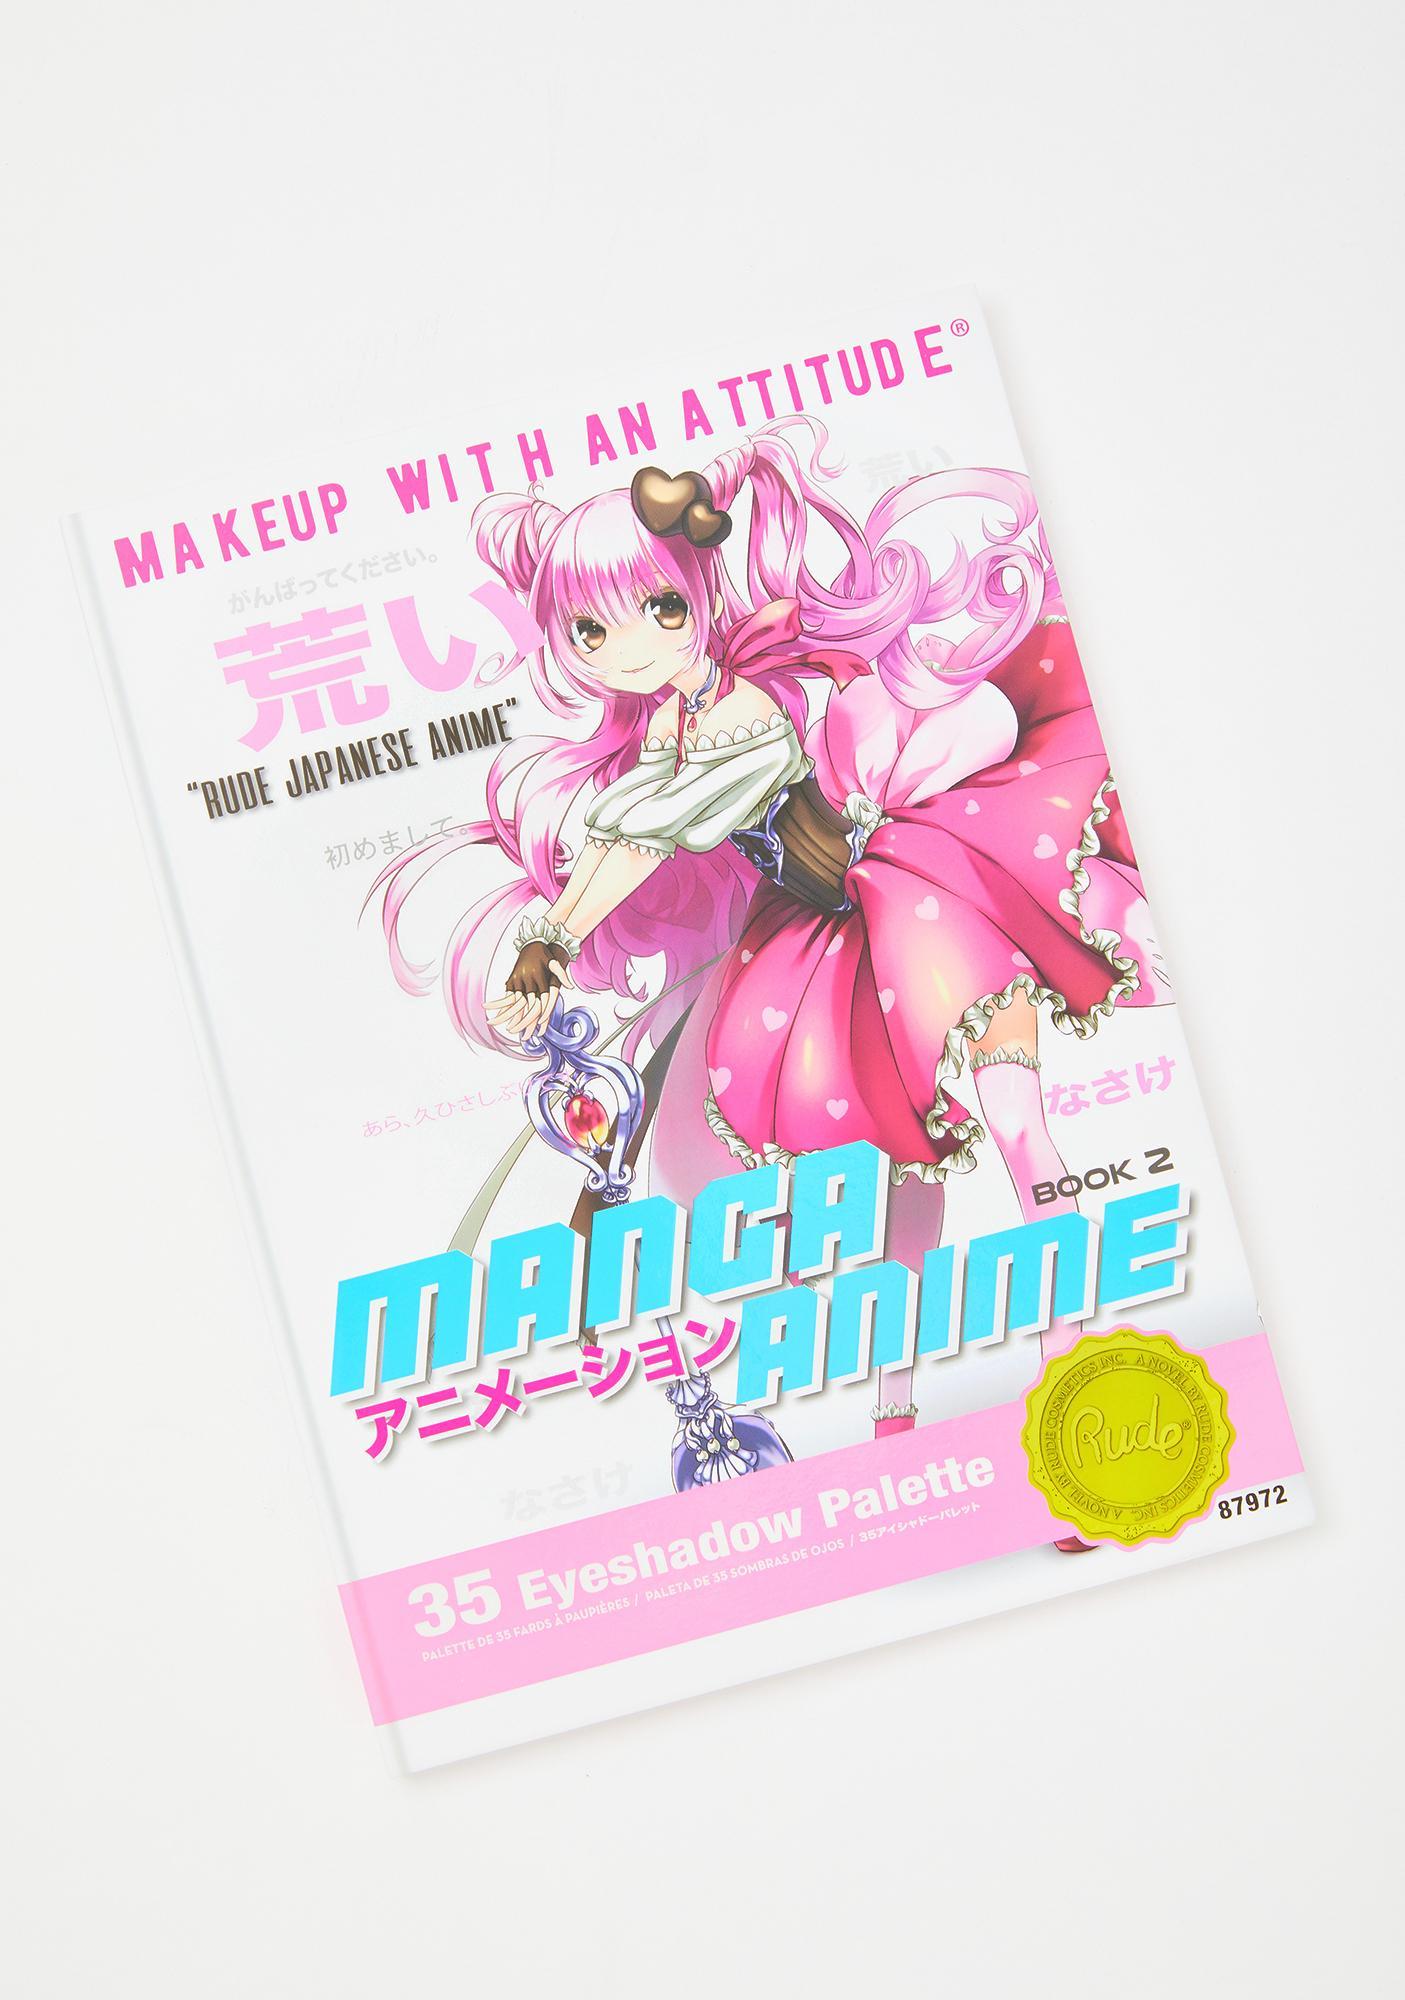 Rude Cosmetics Manga Anime Book 2 Eyeshadow Palette